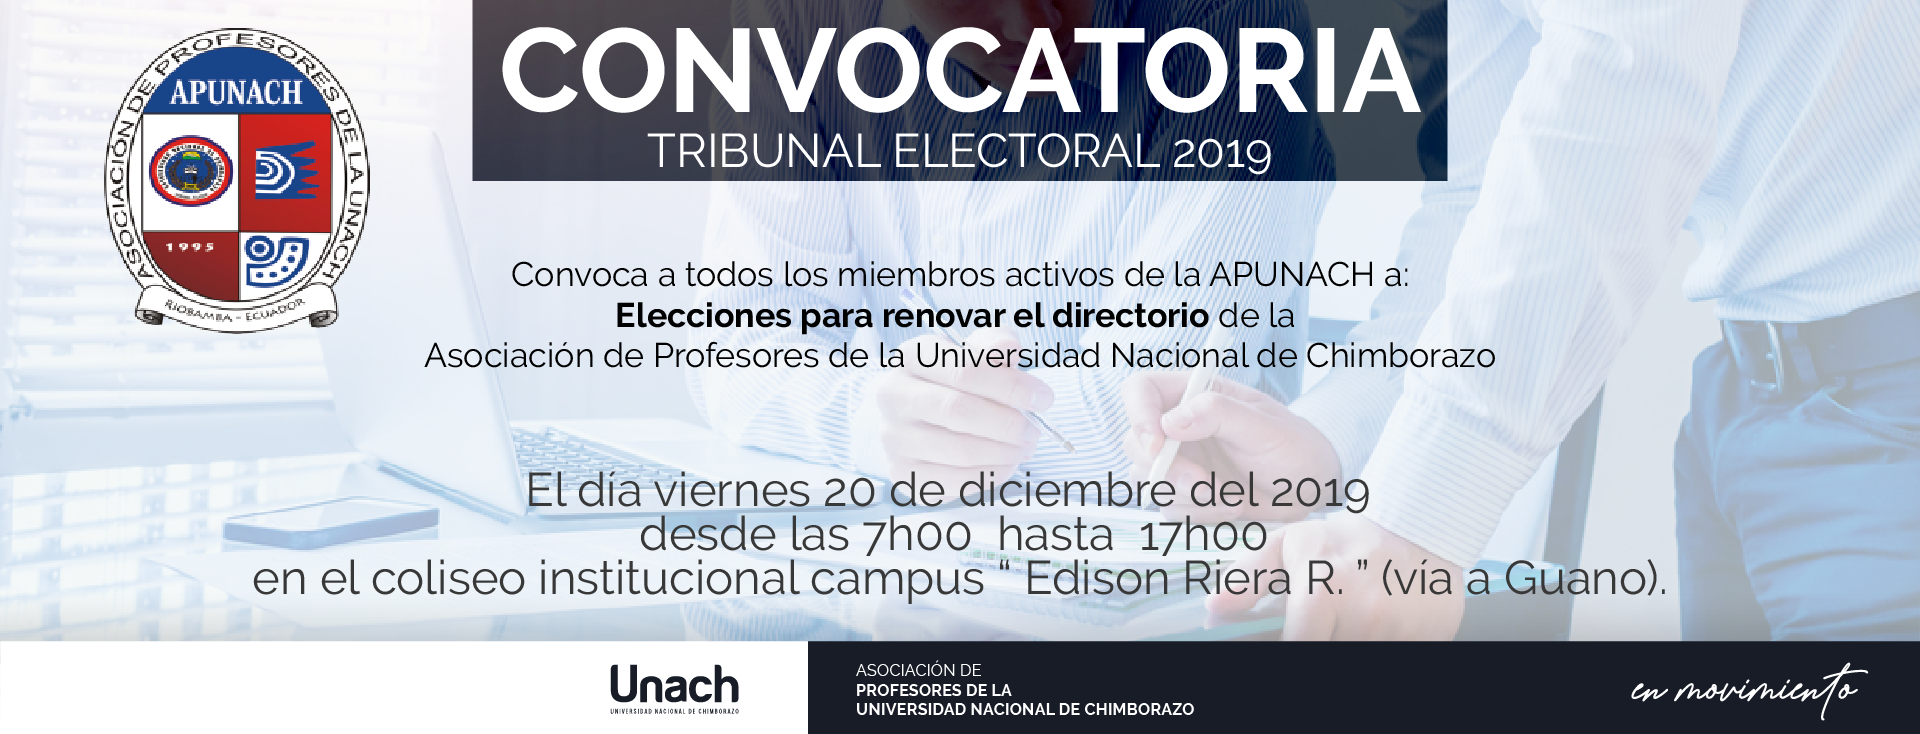 "CONVOCATORIA TRIBUNAL ELECTORAL 2019  ""APUNACH"""